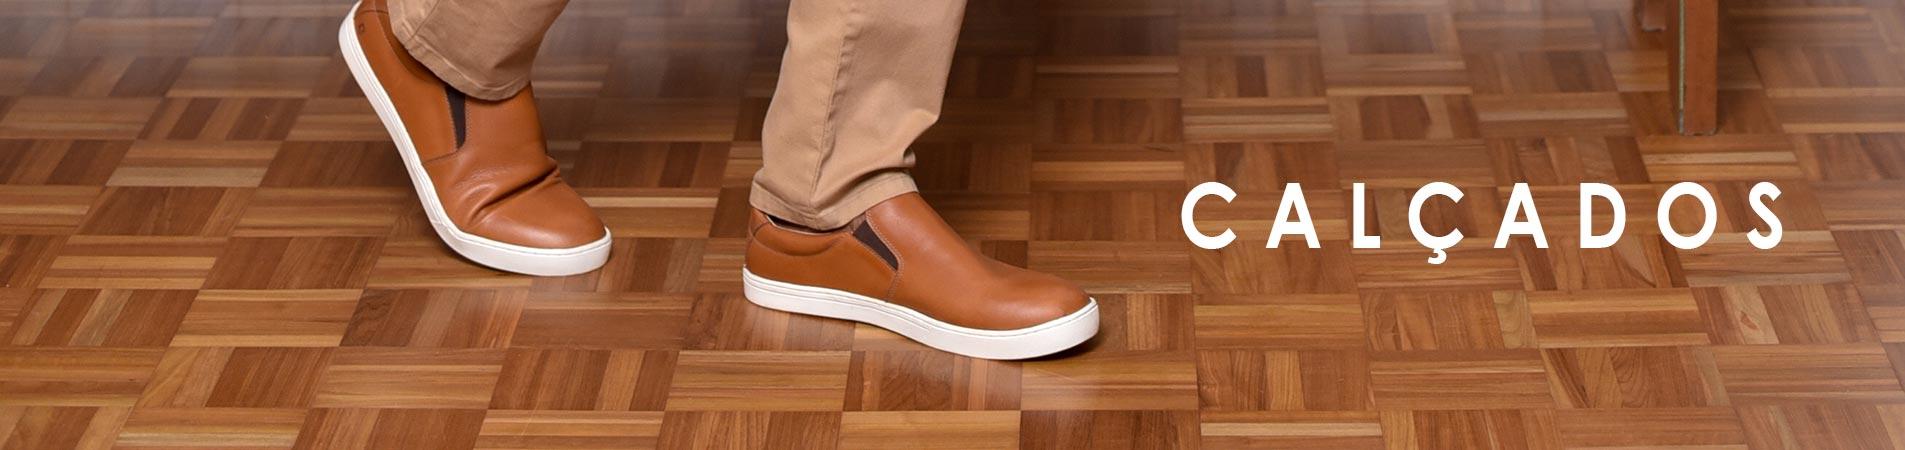 banner calçados